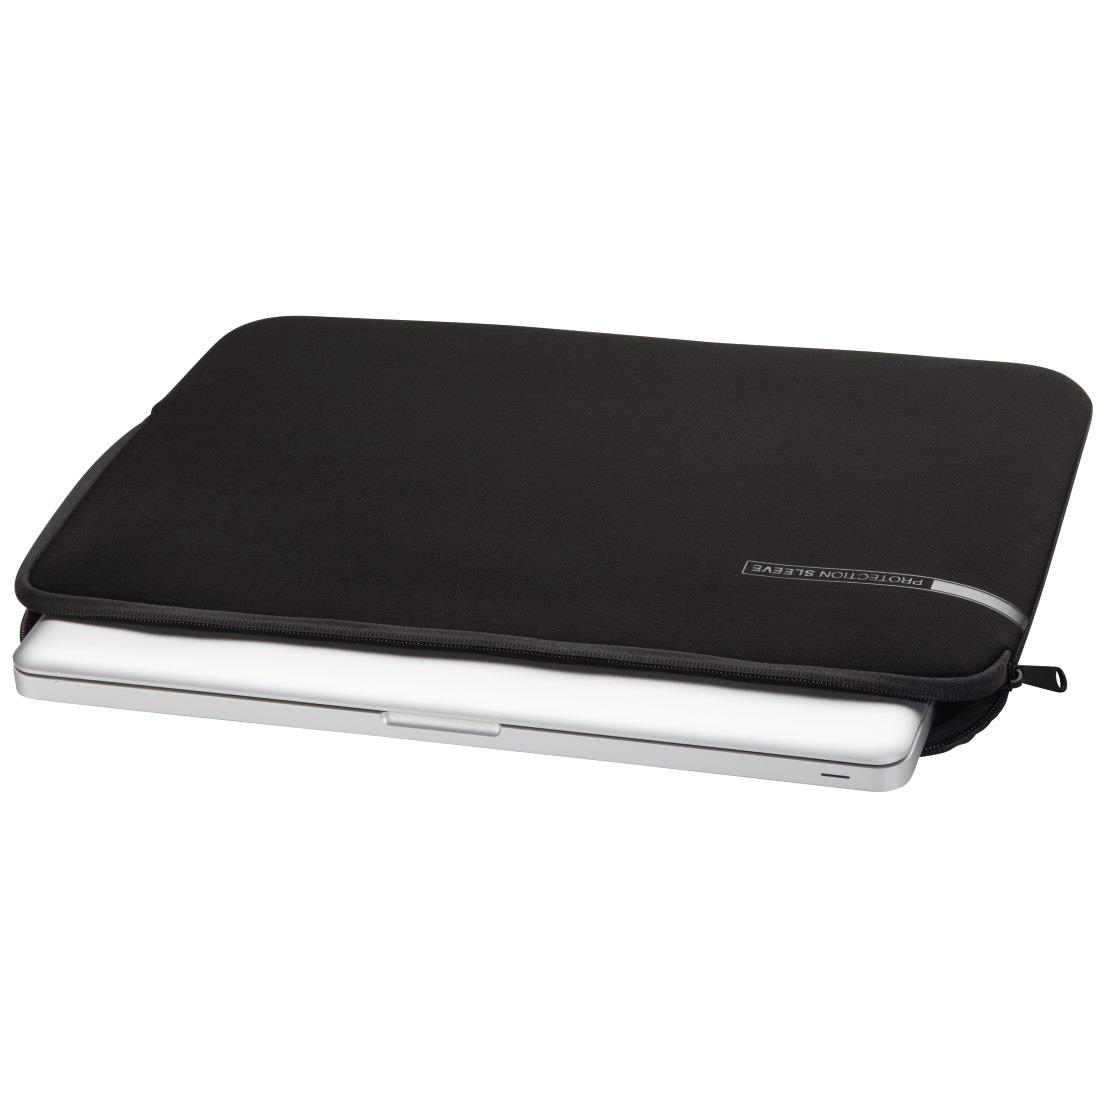 Hama 15.6inch Notebook Sleeve Neoprene Black Ref 00101546